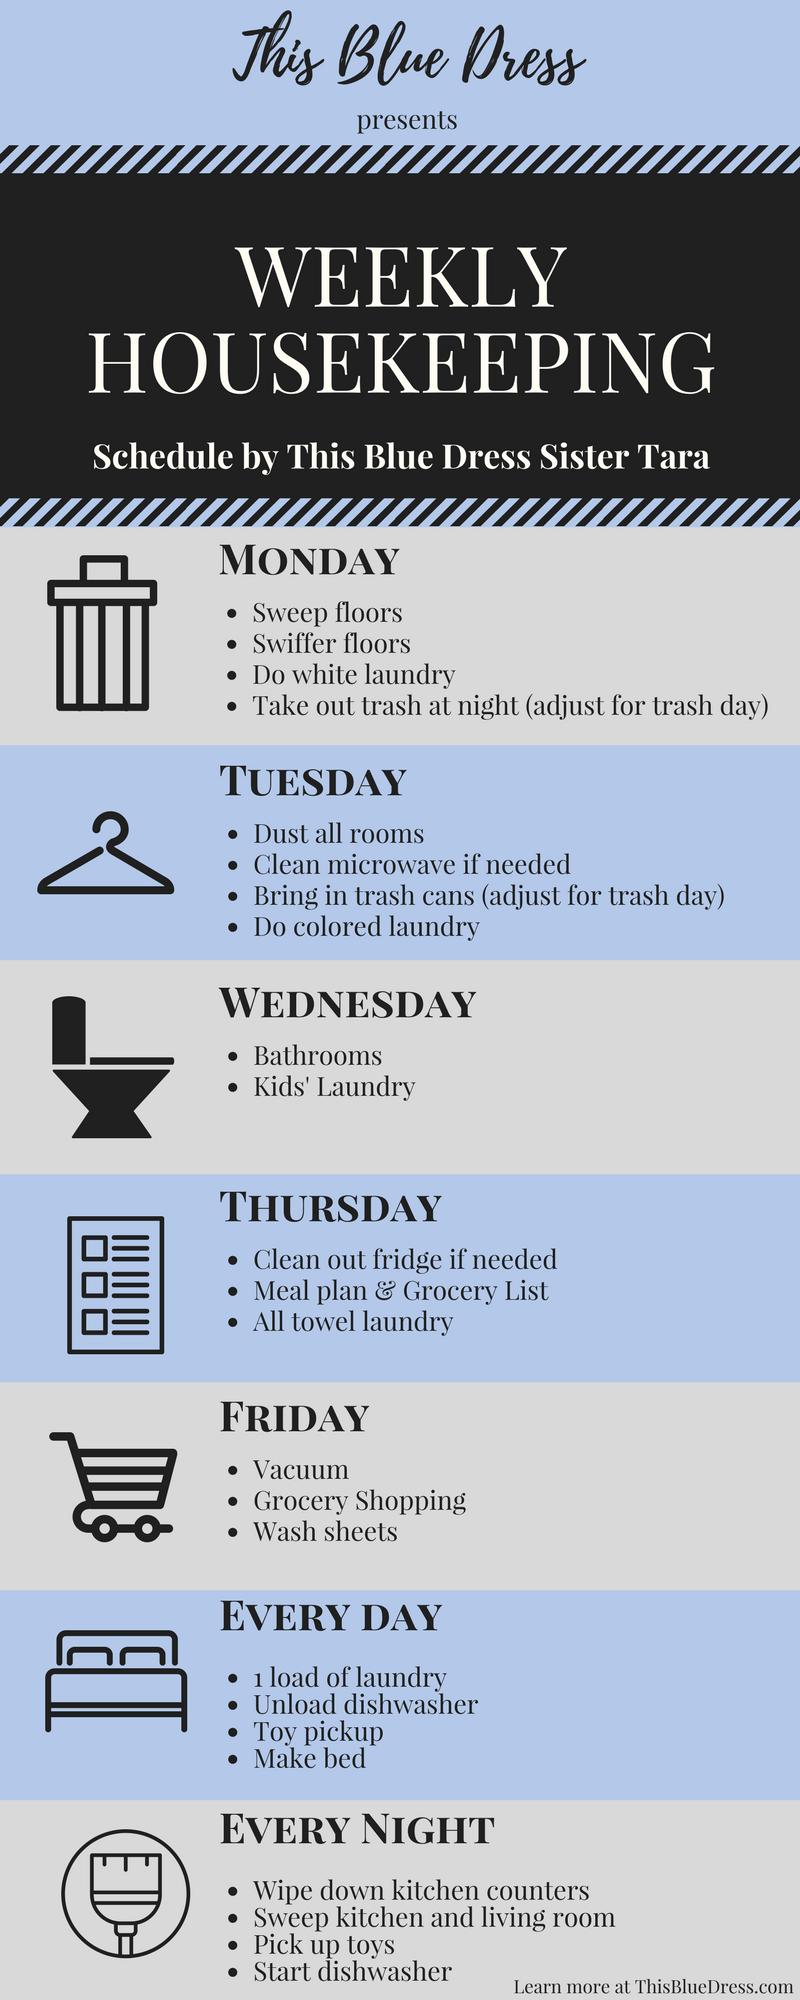 Weekly Housekeeping Schedule Infographic